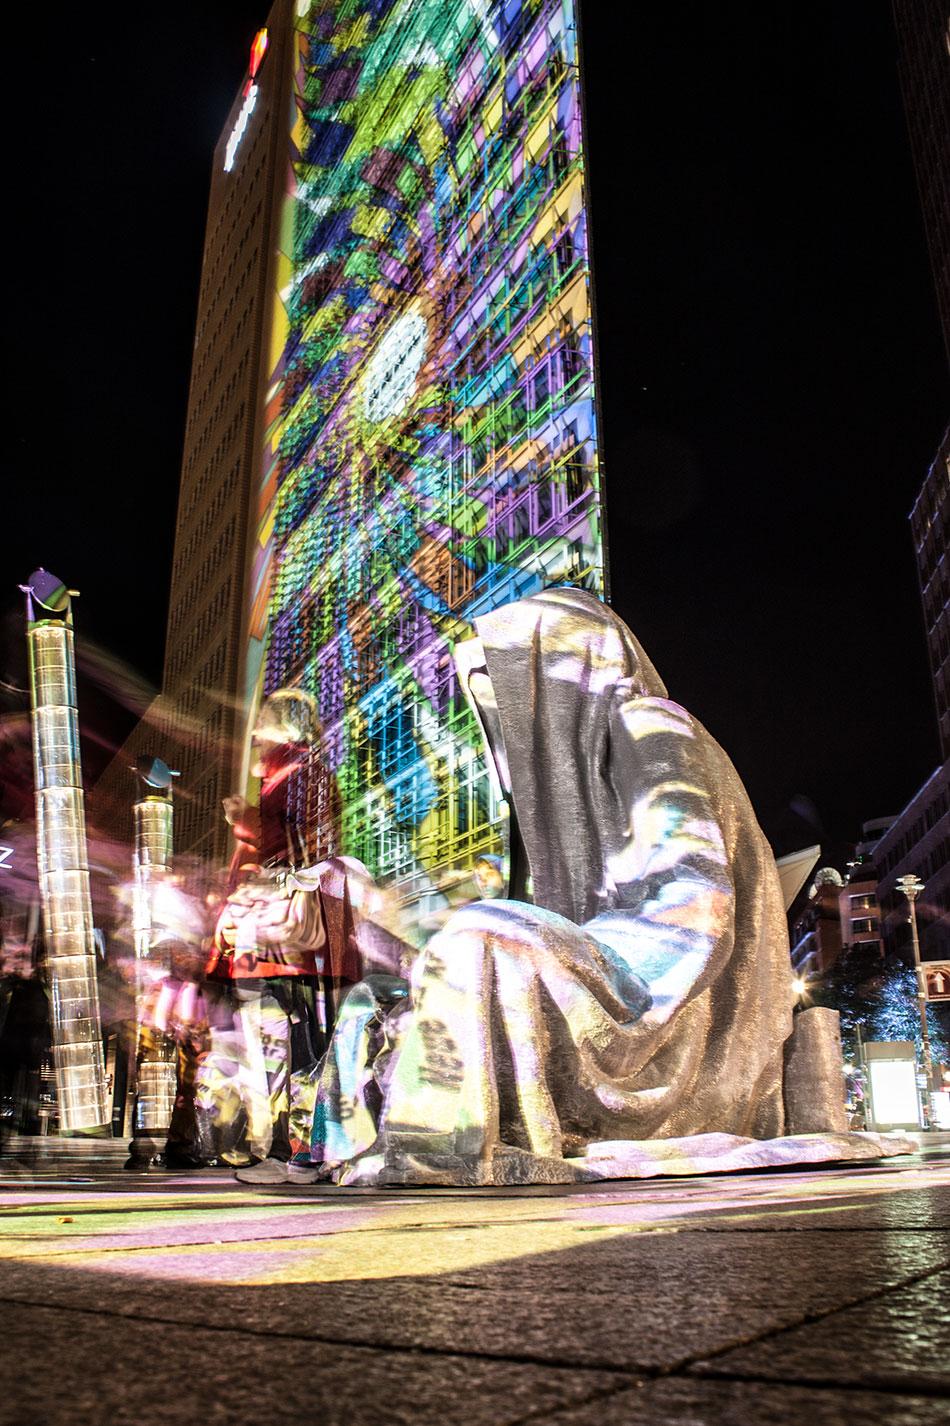 festival-of-lights-berlin-potzdamer-platz-light-art-show-exhibition-lumina-guardians-of-time-manfred-kili-kielnhofer-contemporary-arts-design-sculpture-3212